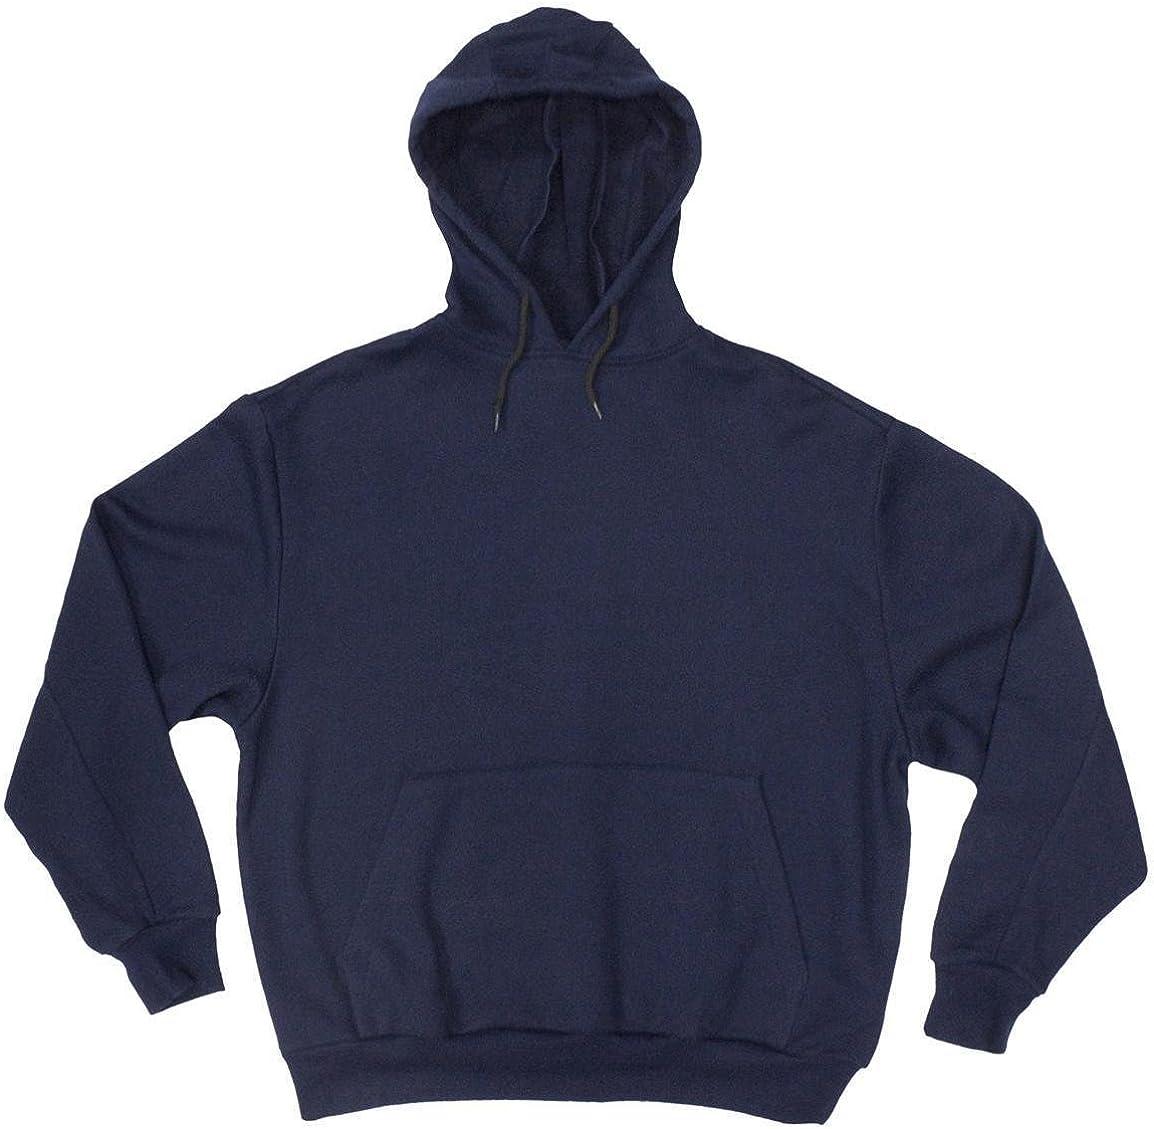 Big and Tall Beefy Hoodie Hooded Sweatshirts Made in USA